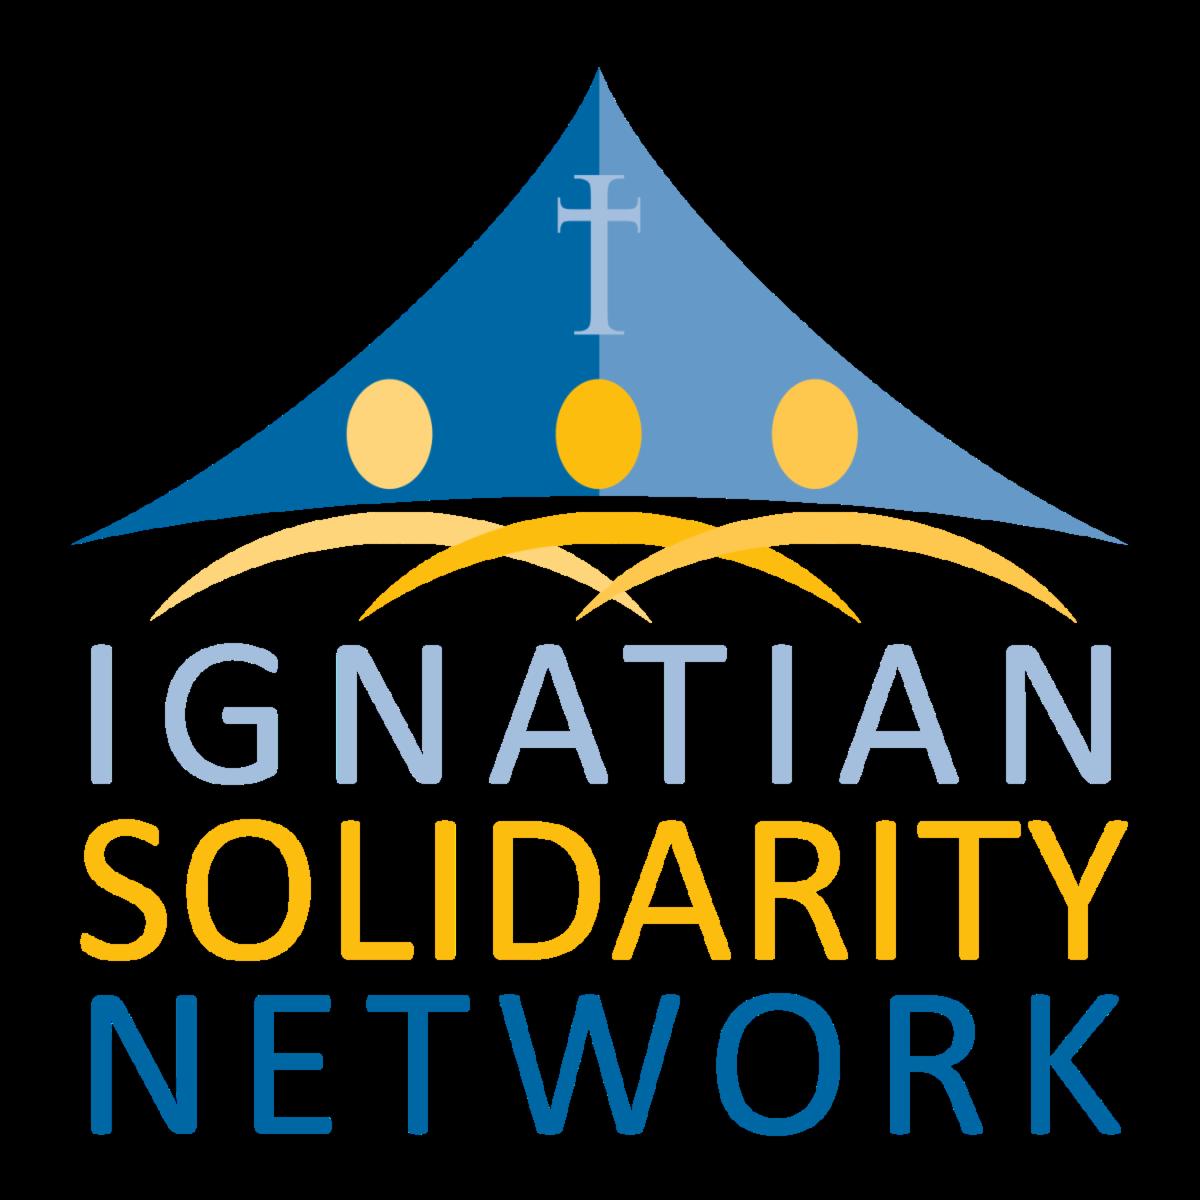 Ignatian Solidarity Network logo